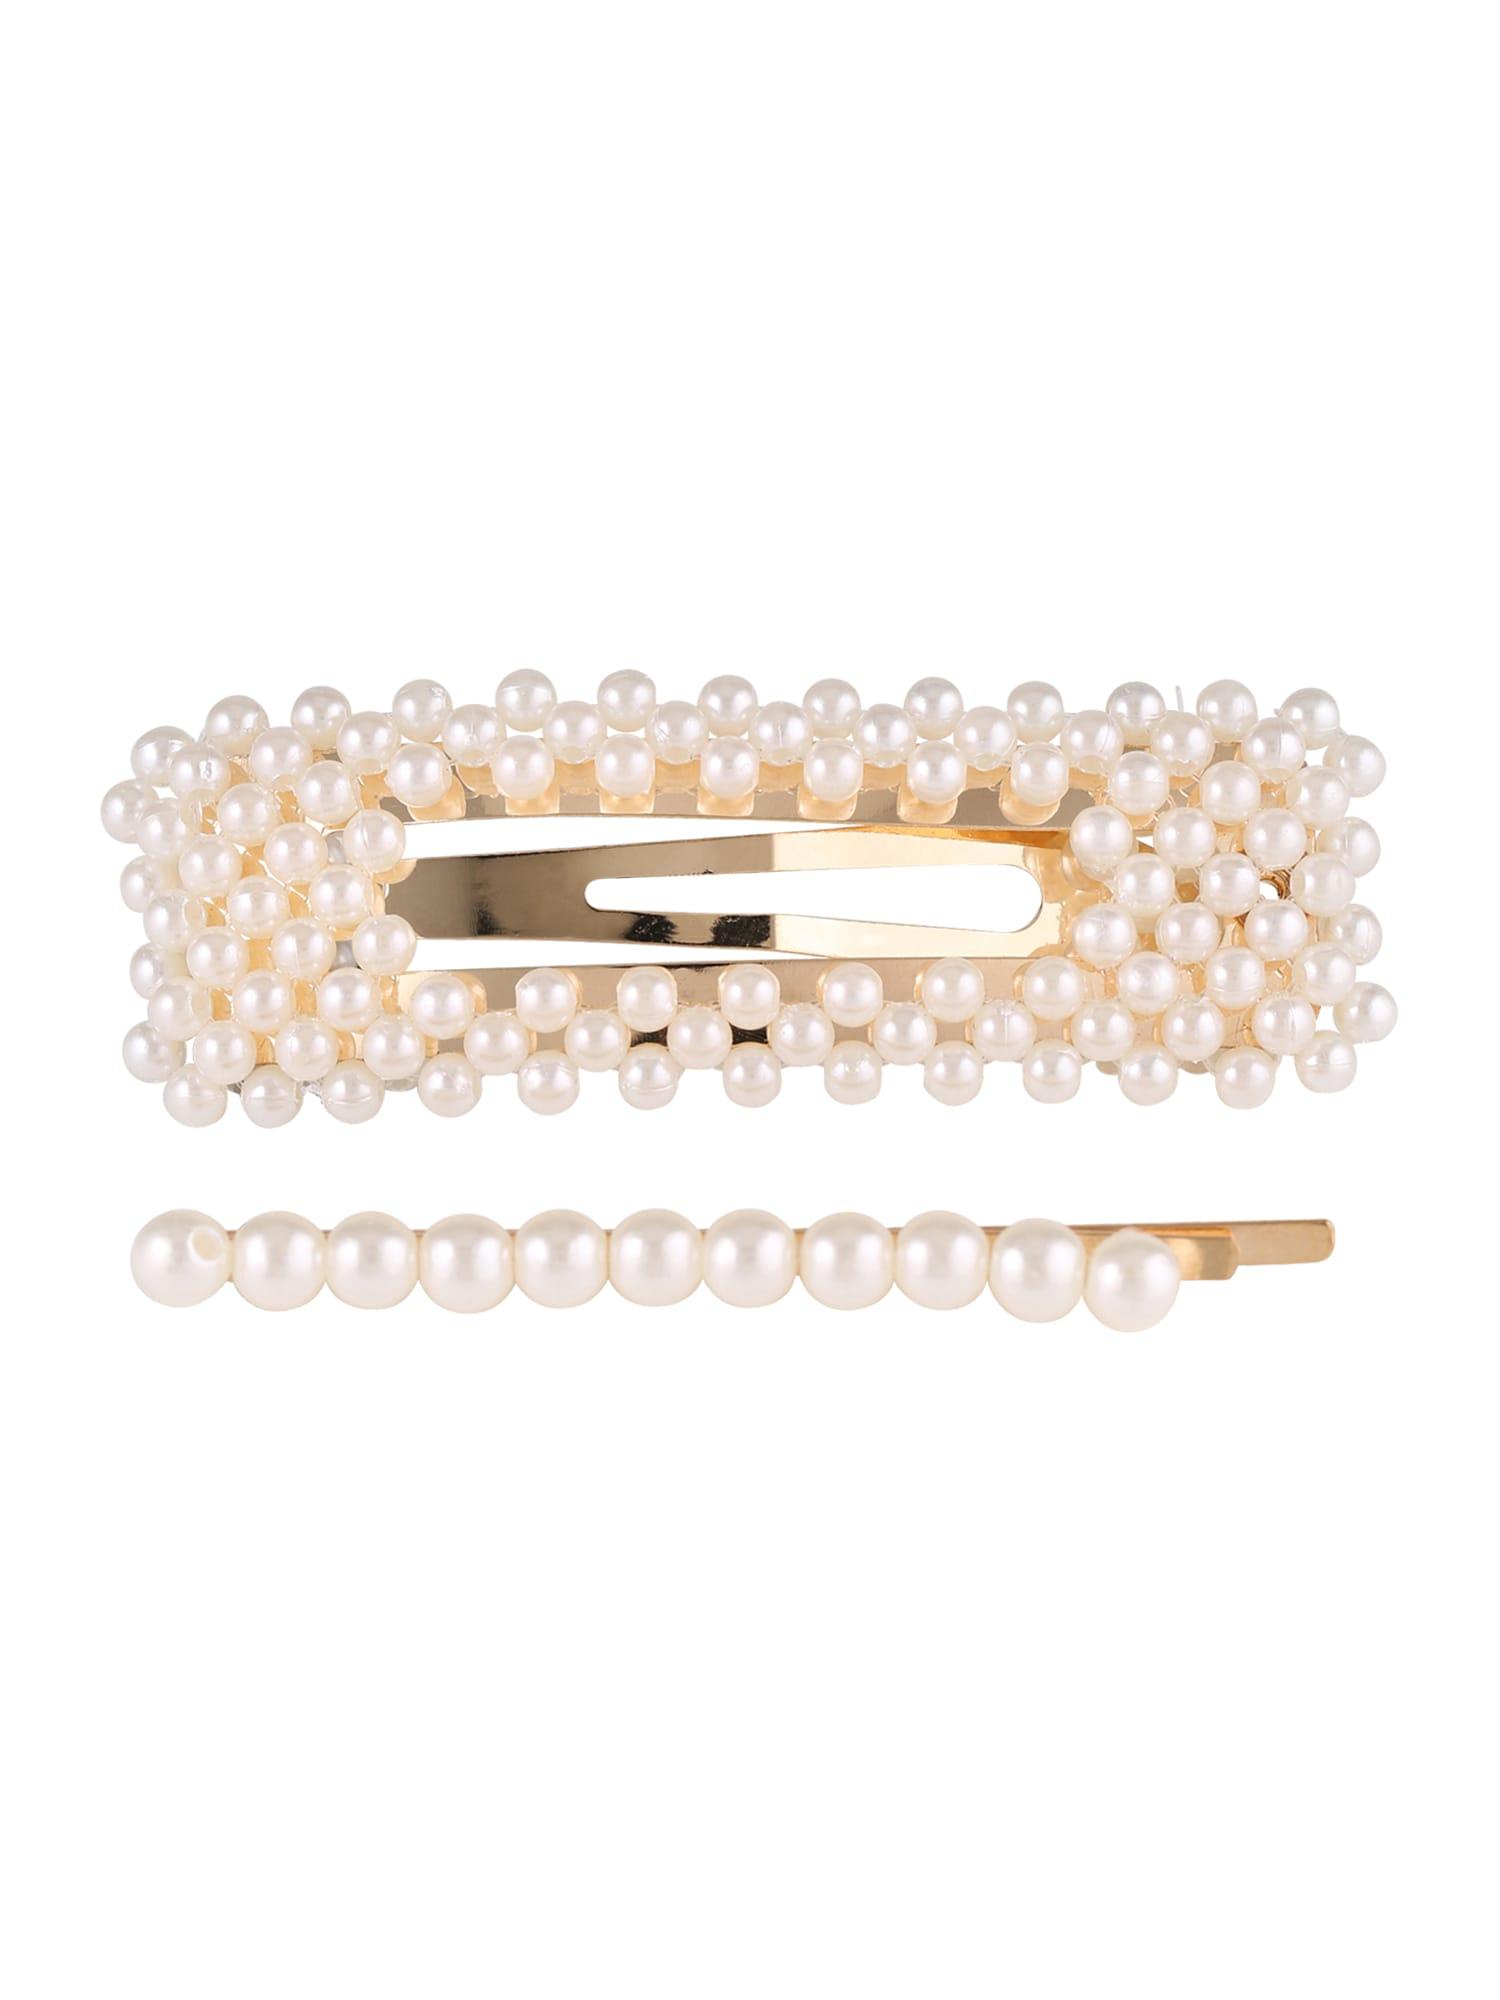 Šperky do vlasů Sea Pearl Clip Single Pearl Needle bílá perlově bílá We Are Flowergirls